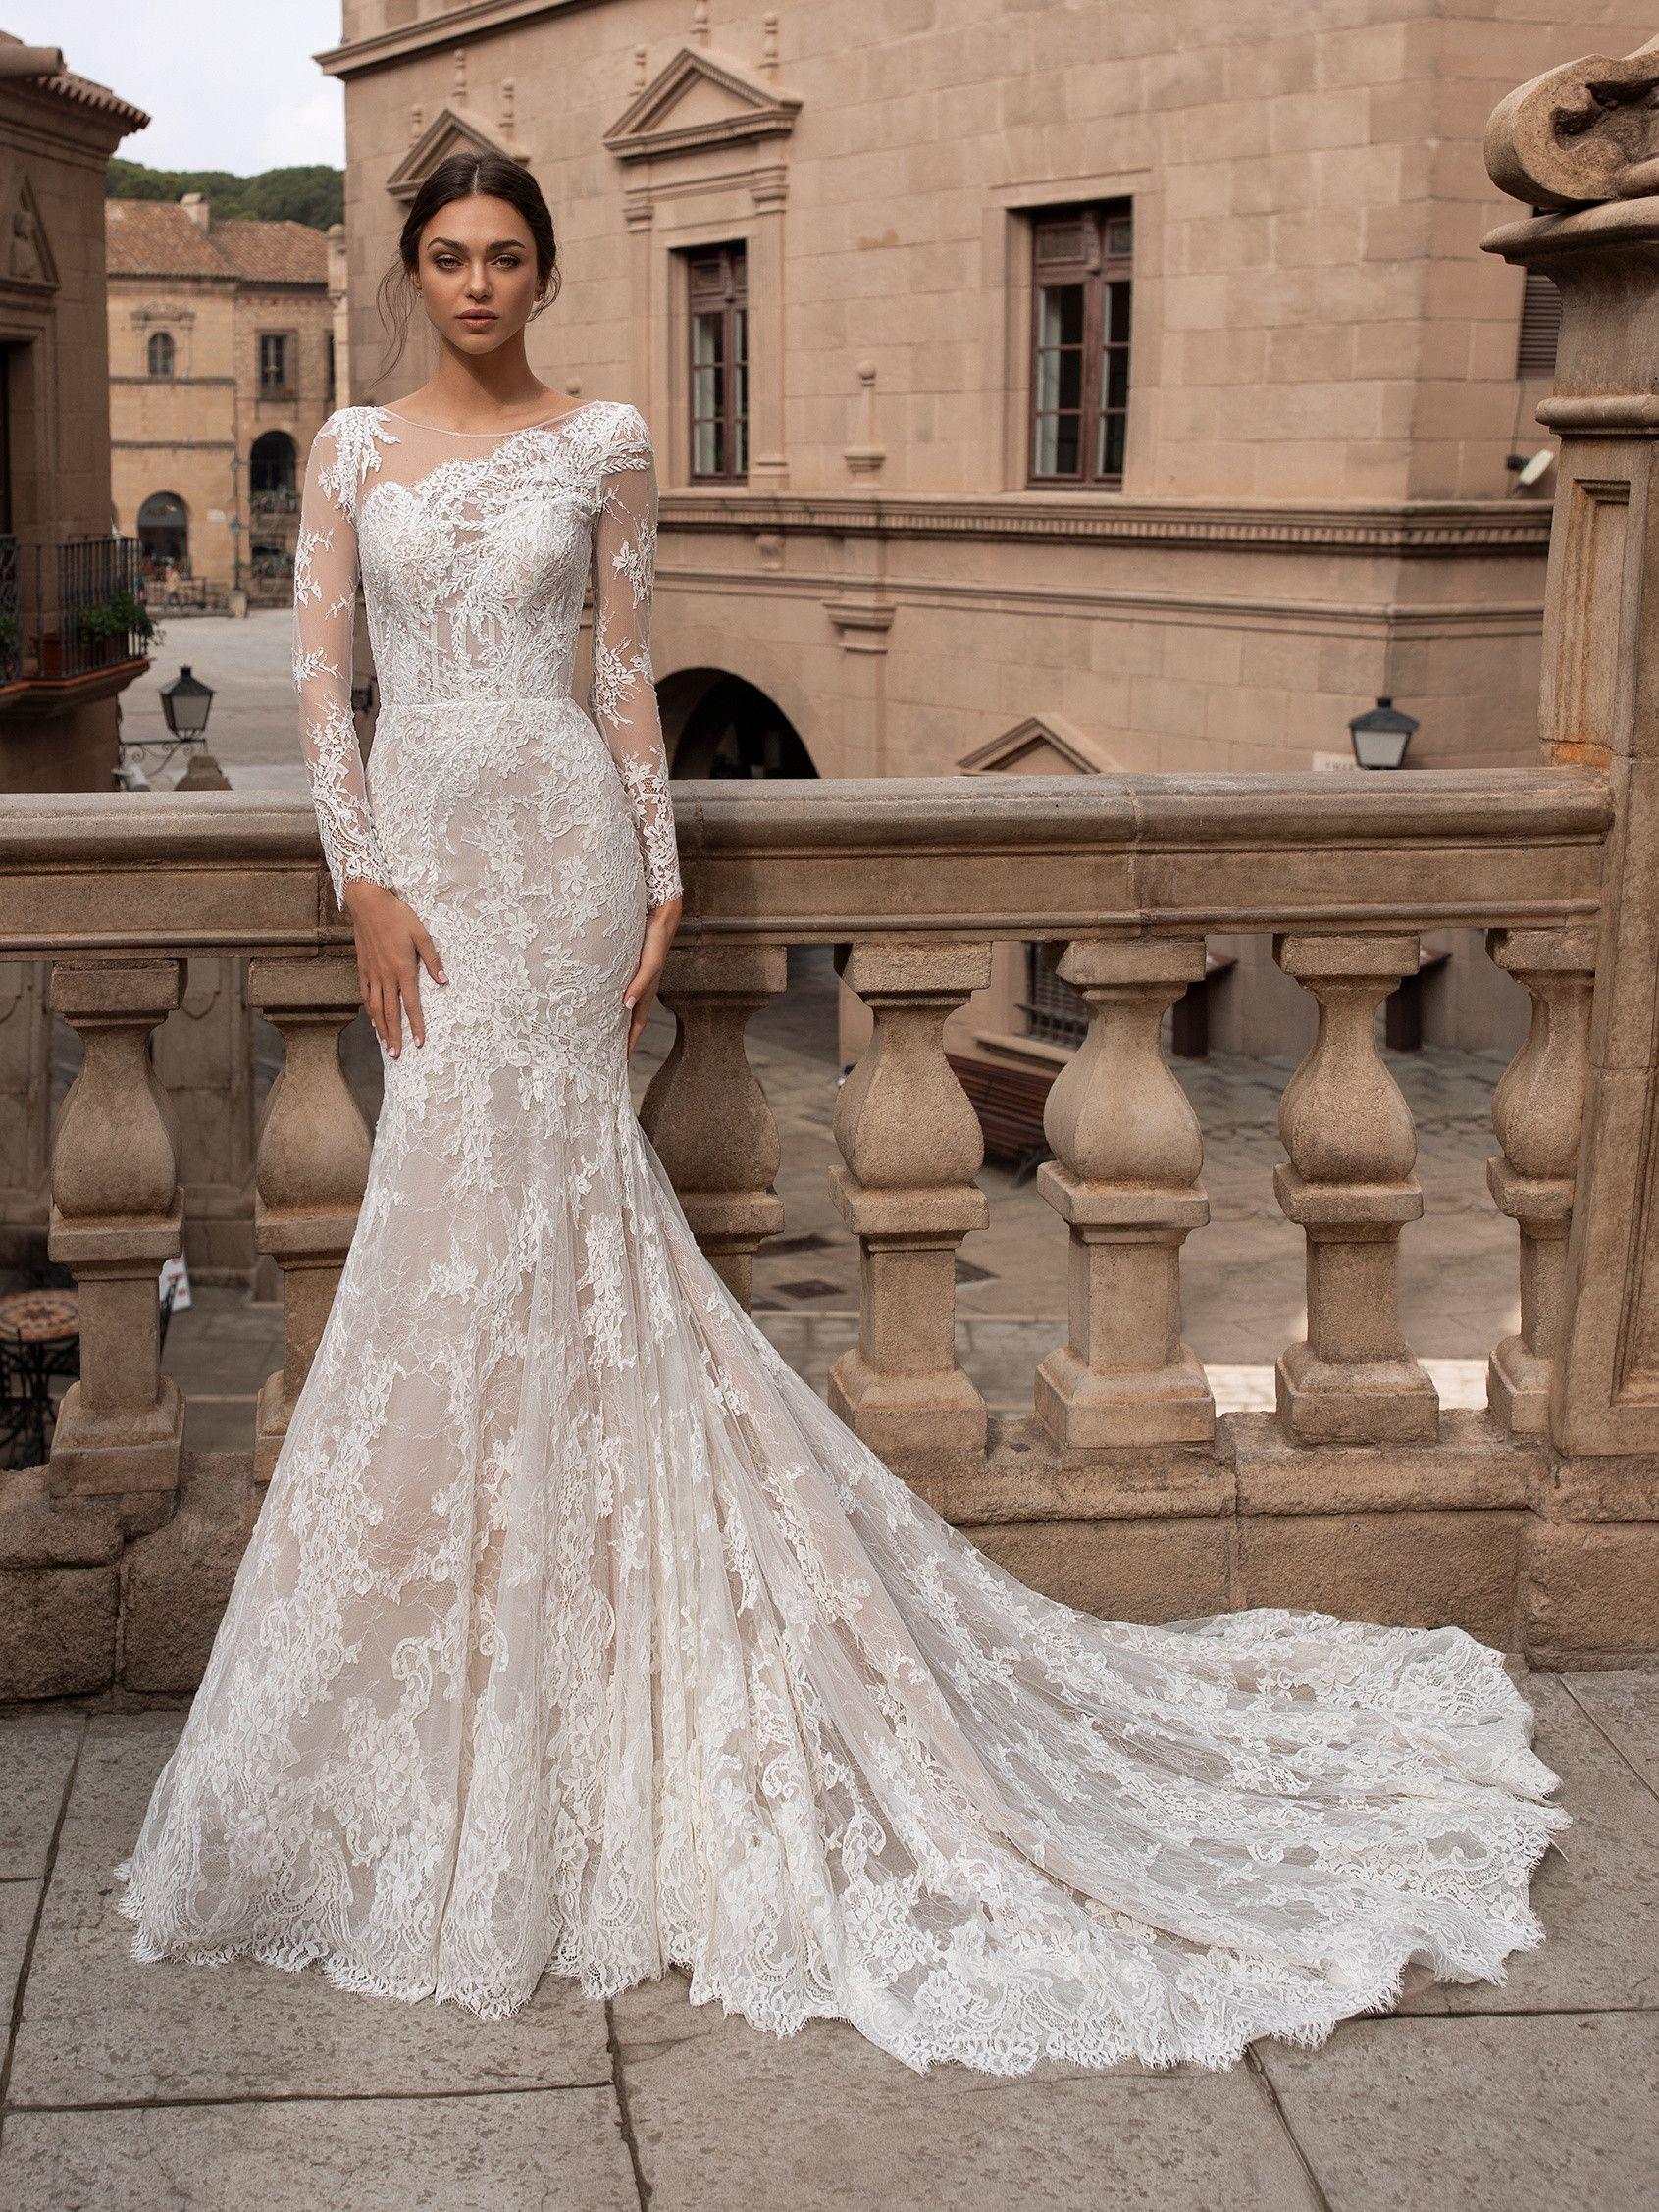 Mermaid Wedding Dress With Asymmetric Neckline And Tattoo Effect Back Jennifer Atelier Satin Wedding Gown Pronovias Wedding Dress Asymmetrical Wedding Dress [ 1076 x 761 Pixel ]